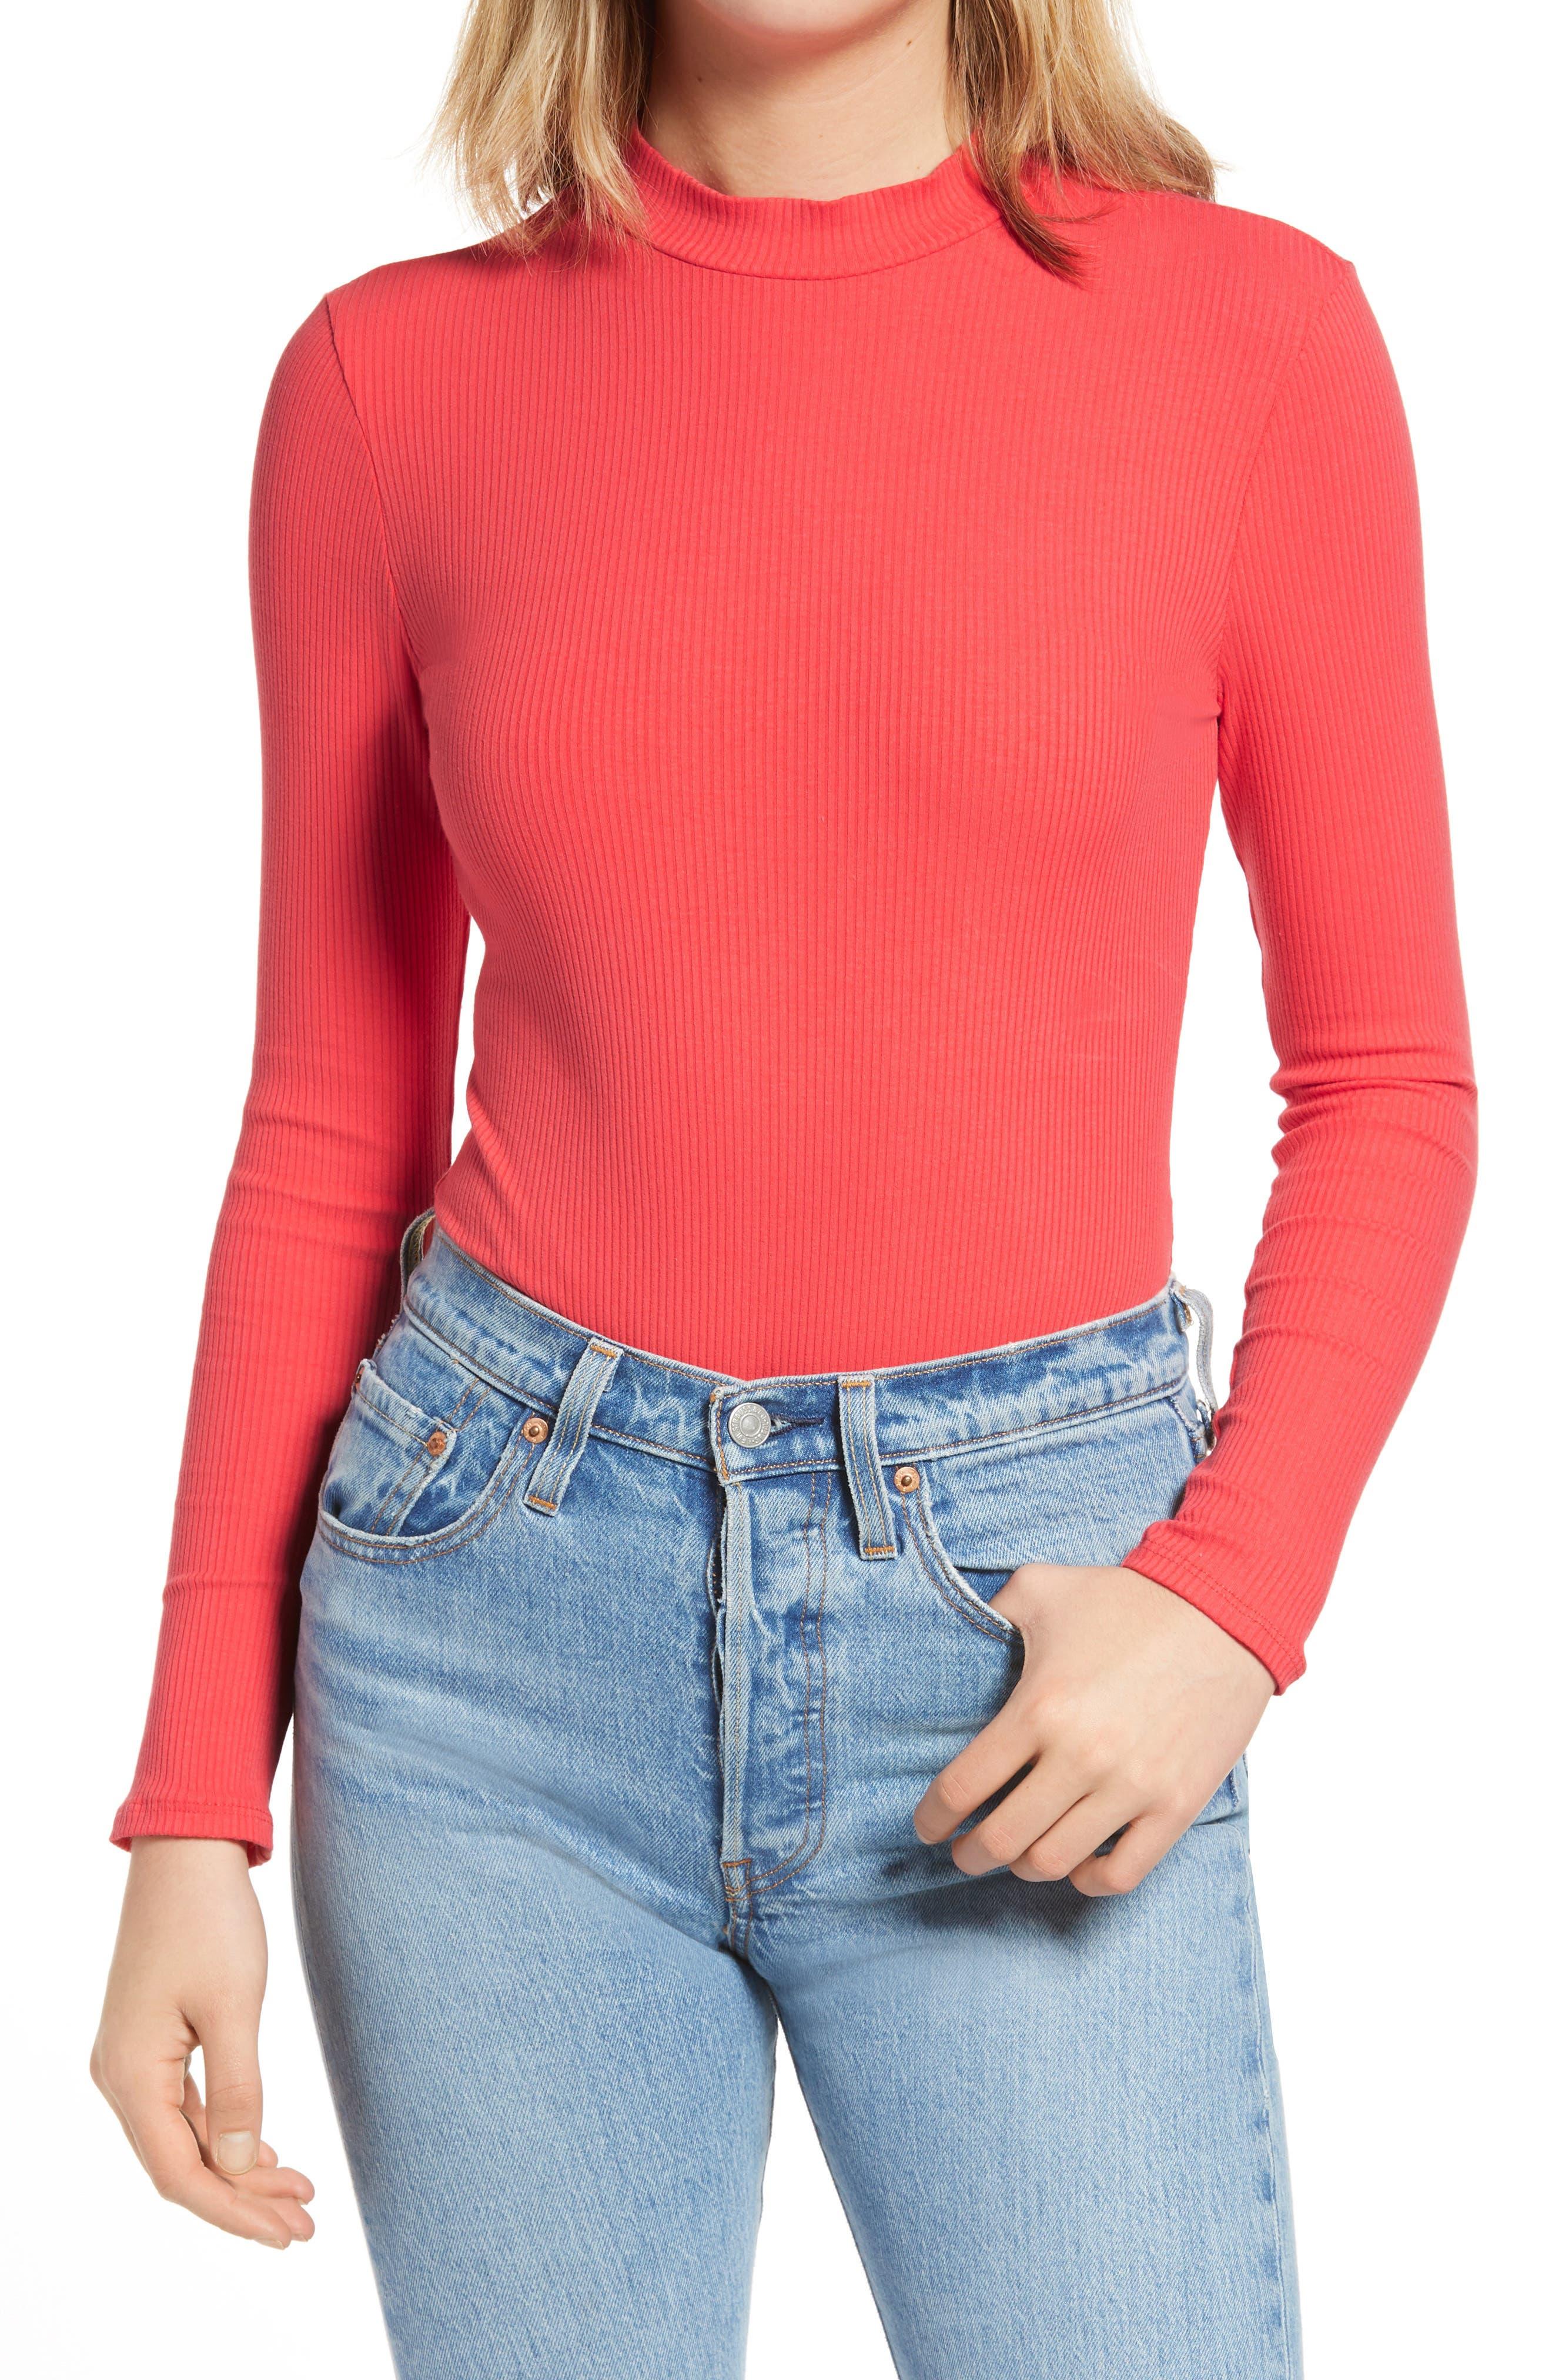 Brand RED WAGON Boys Colour Block Long Sleeve Top